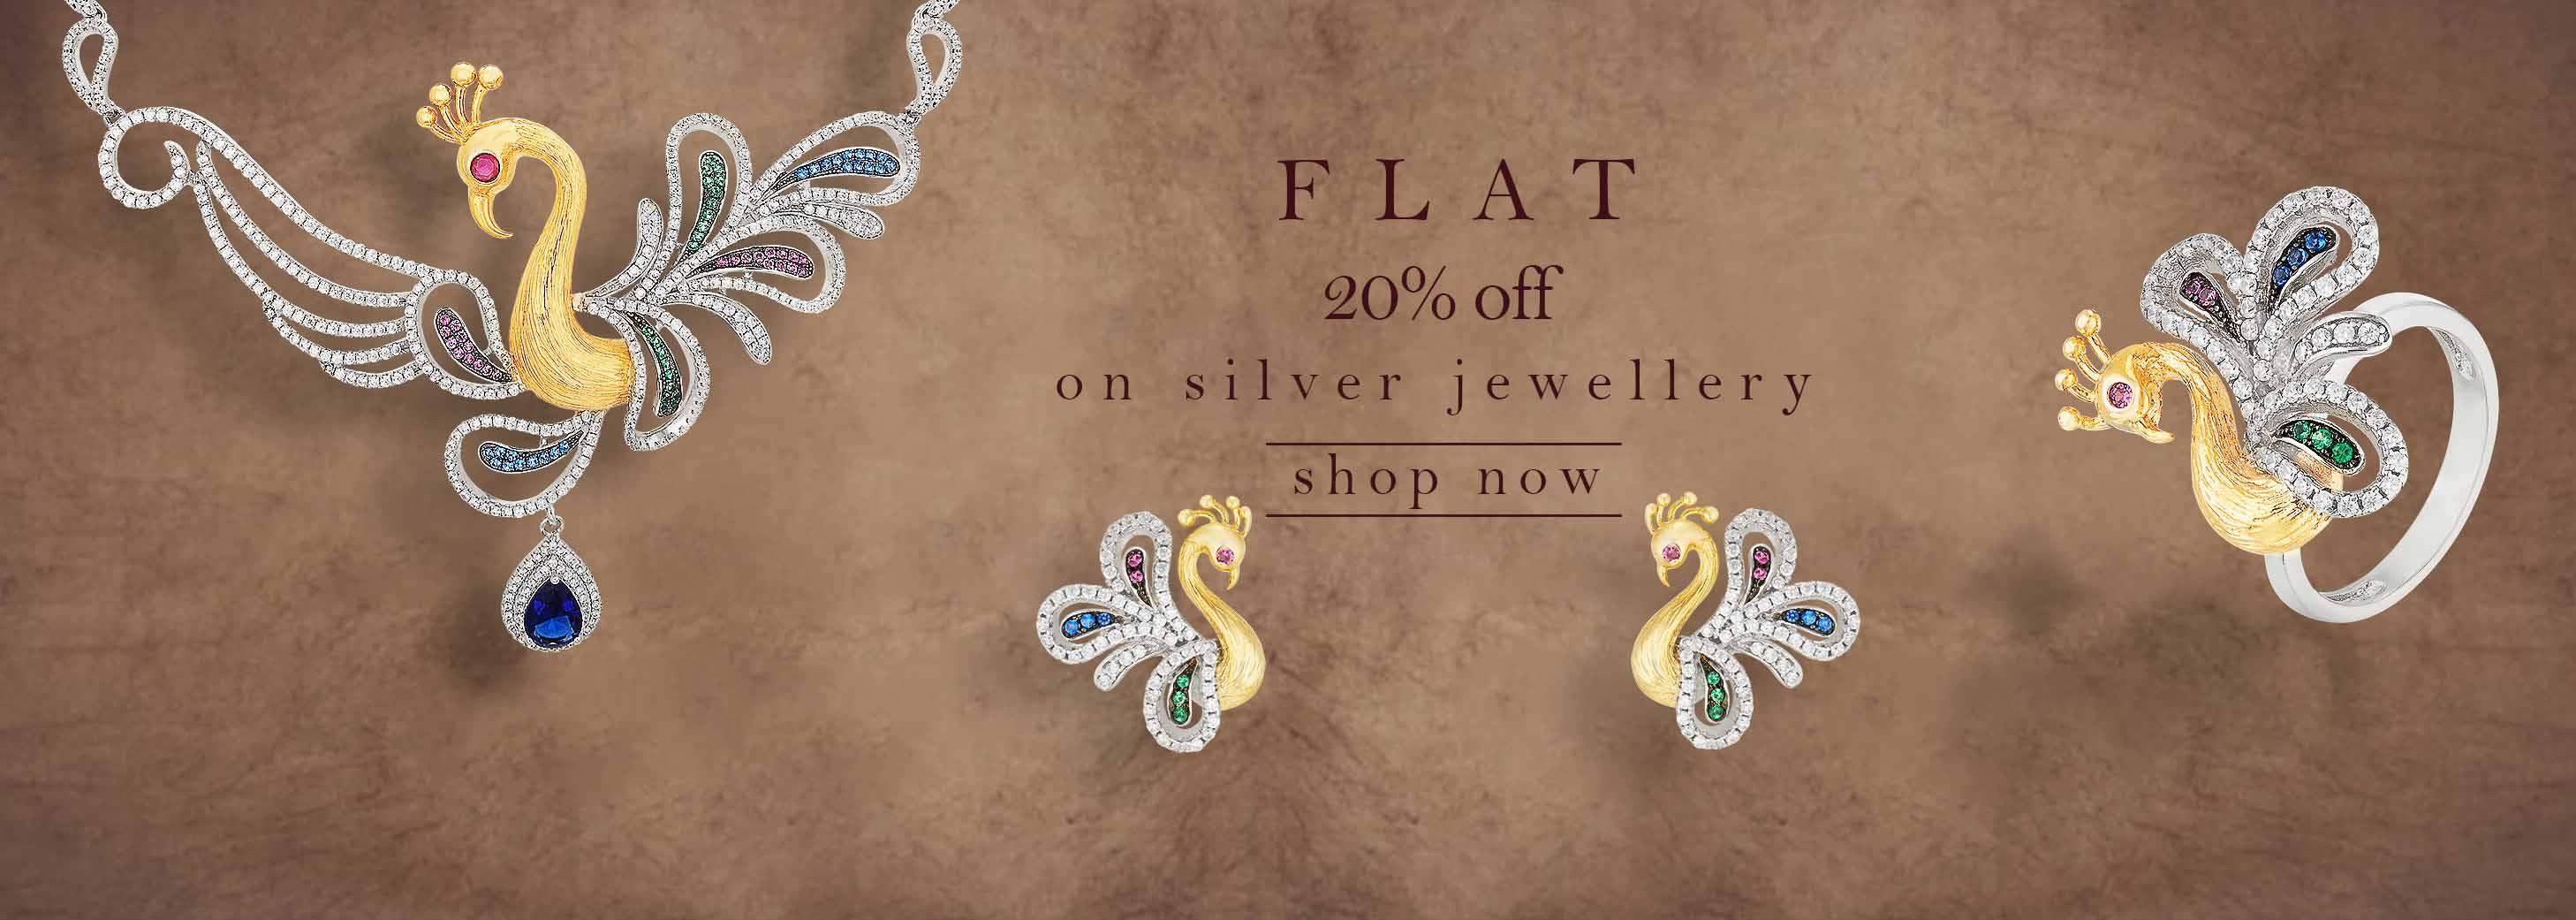 Silver Jewellery offer